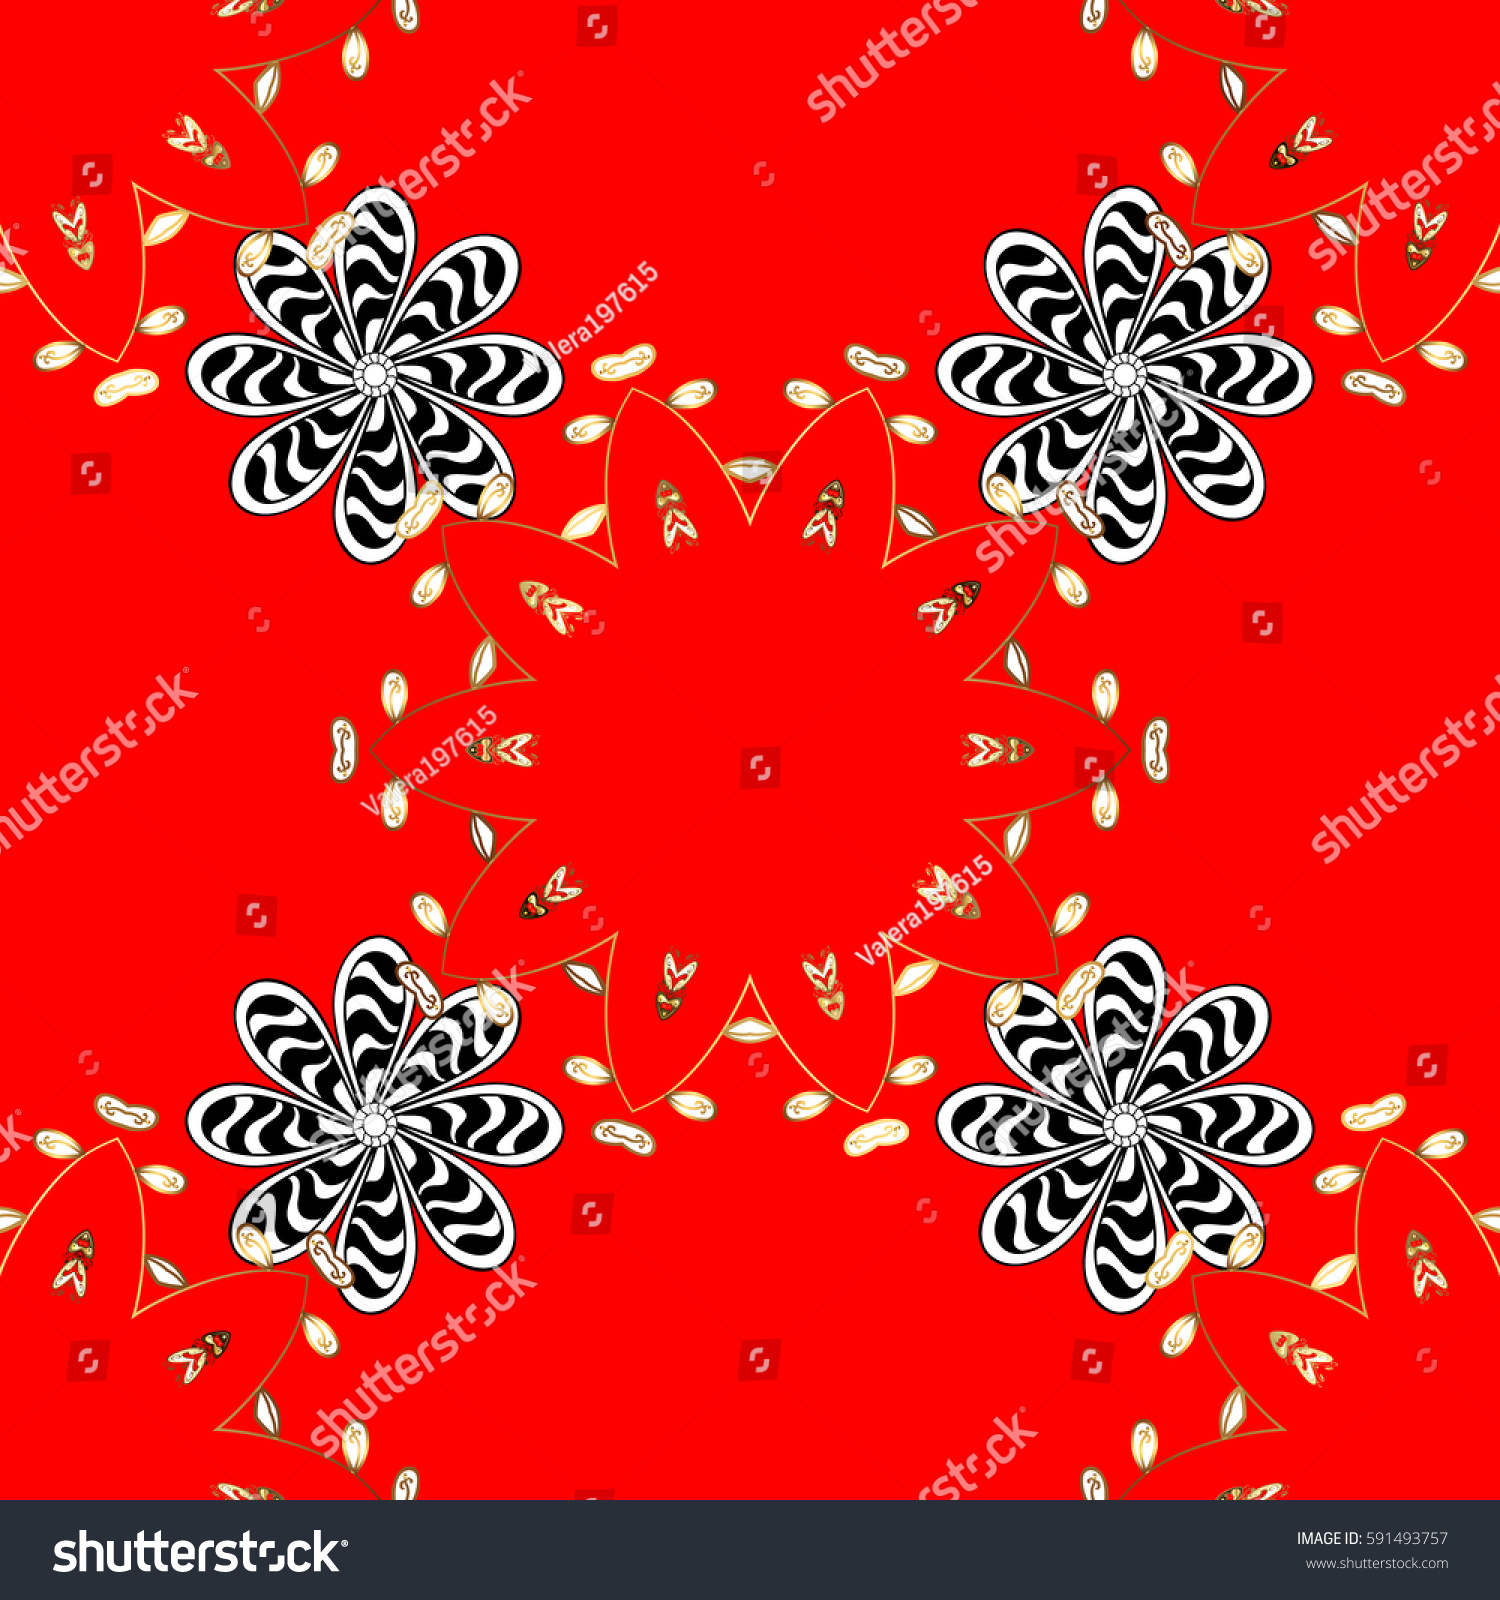 Gold floral pattern wallpaper